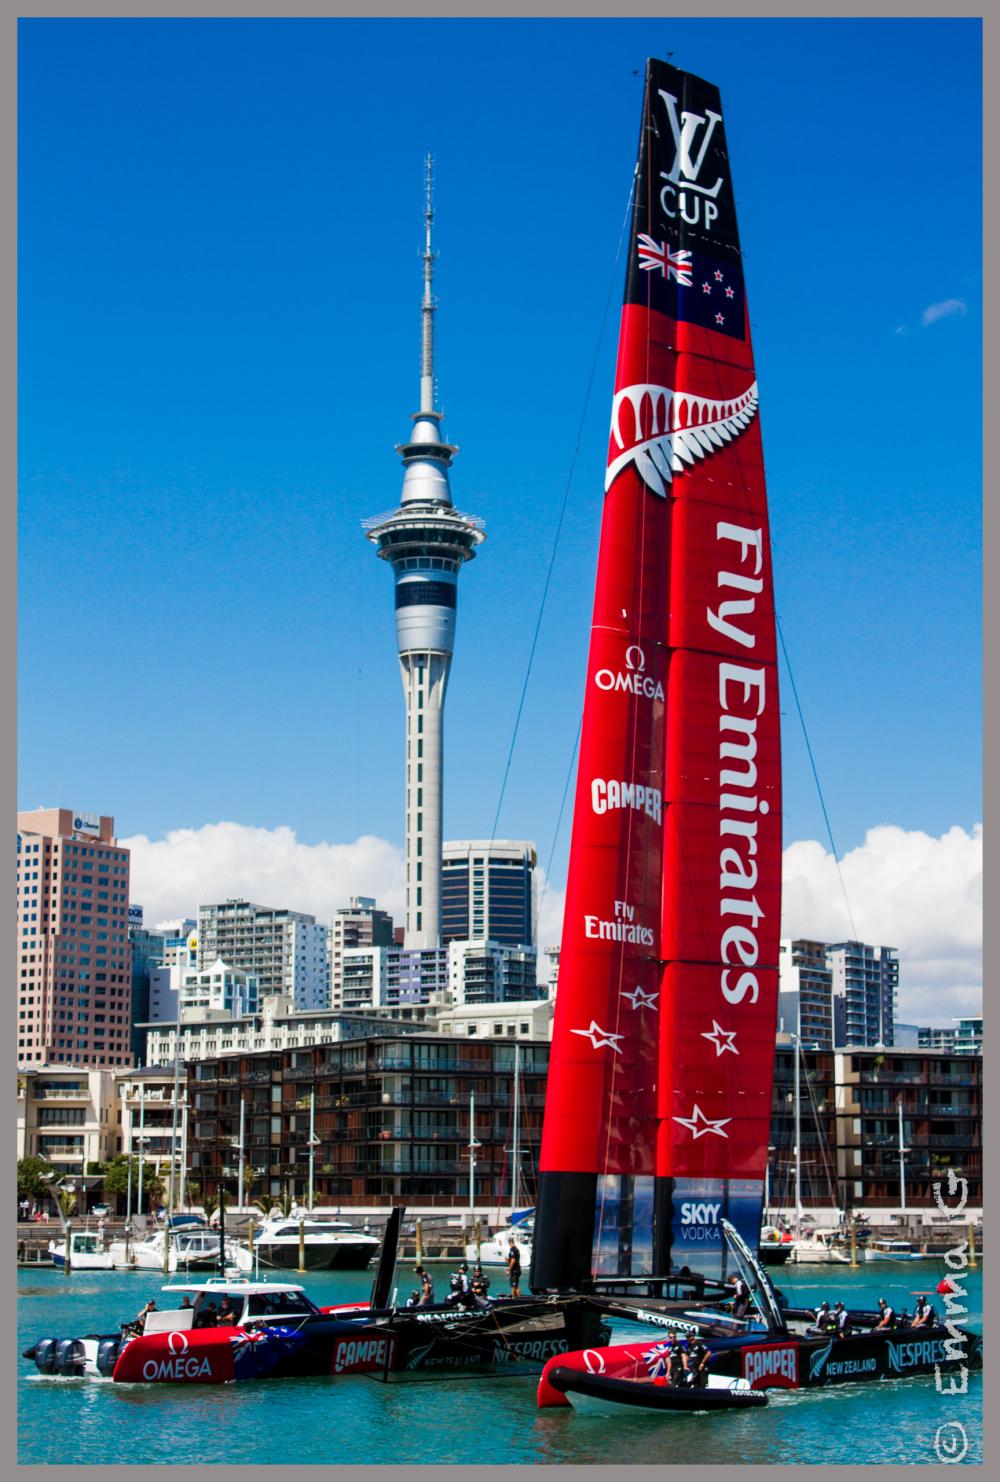 Team NZ - America's Cup